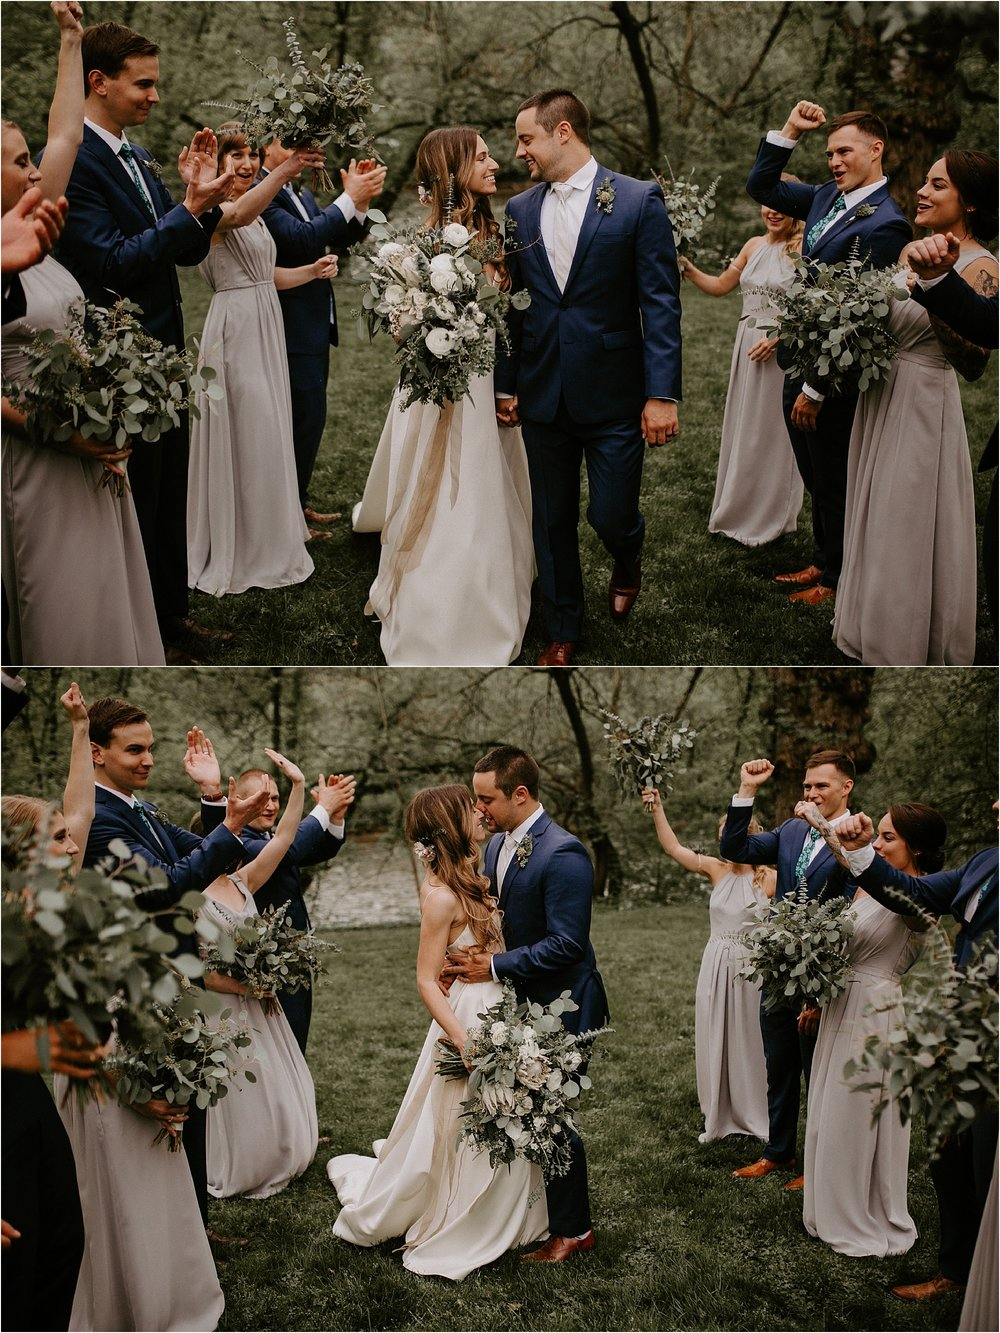 Sarah_Brookhart_Lancaster_PA_Wedding_Photographer_0040.jpg